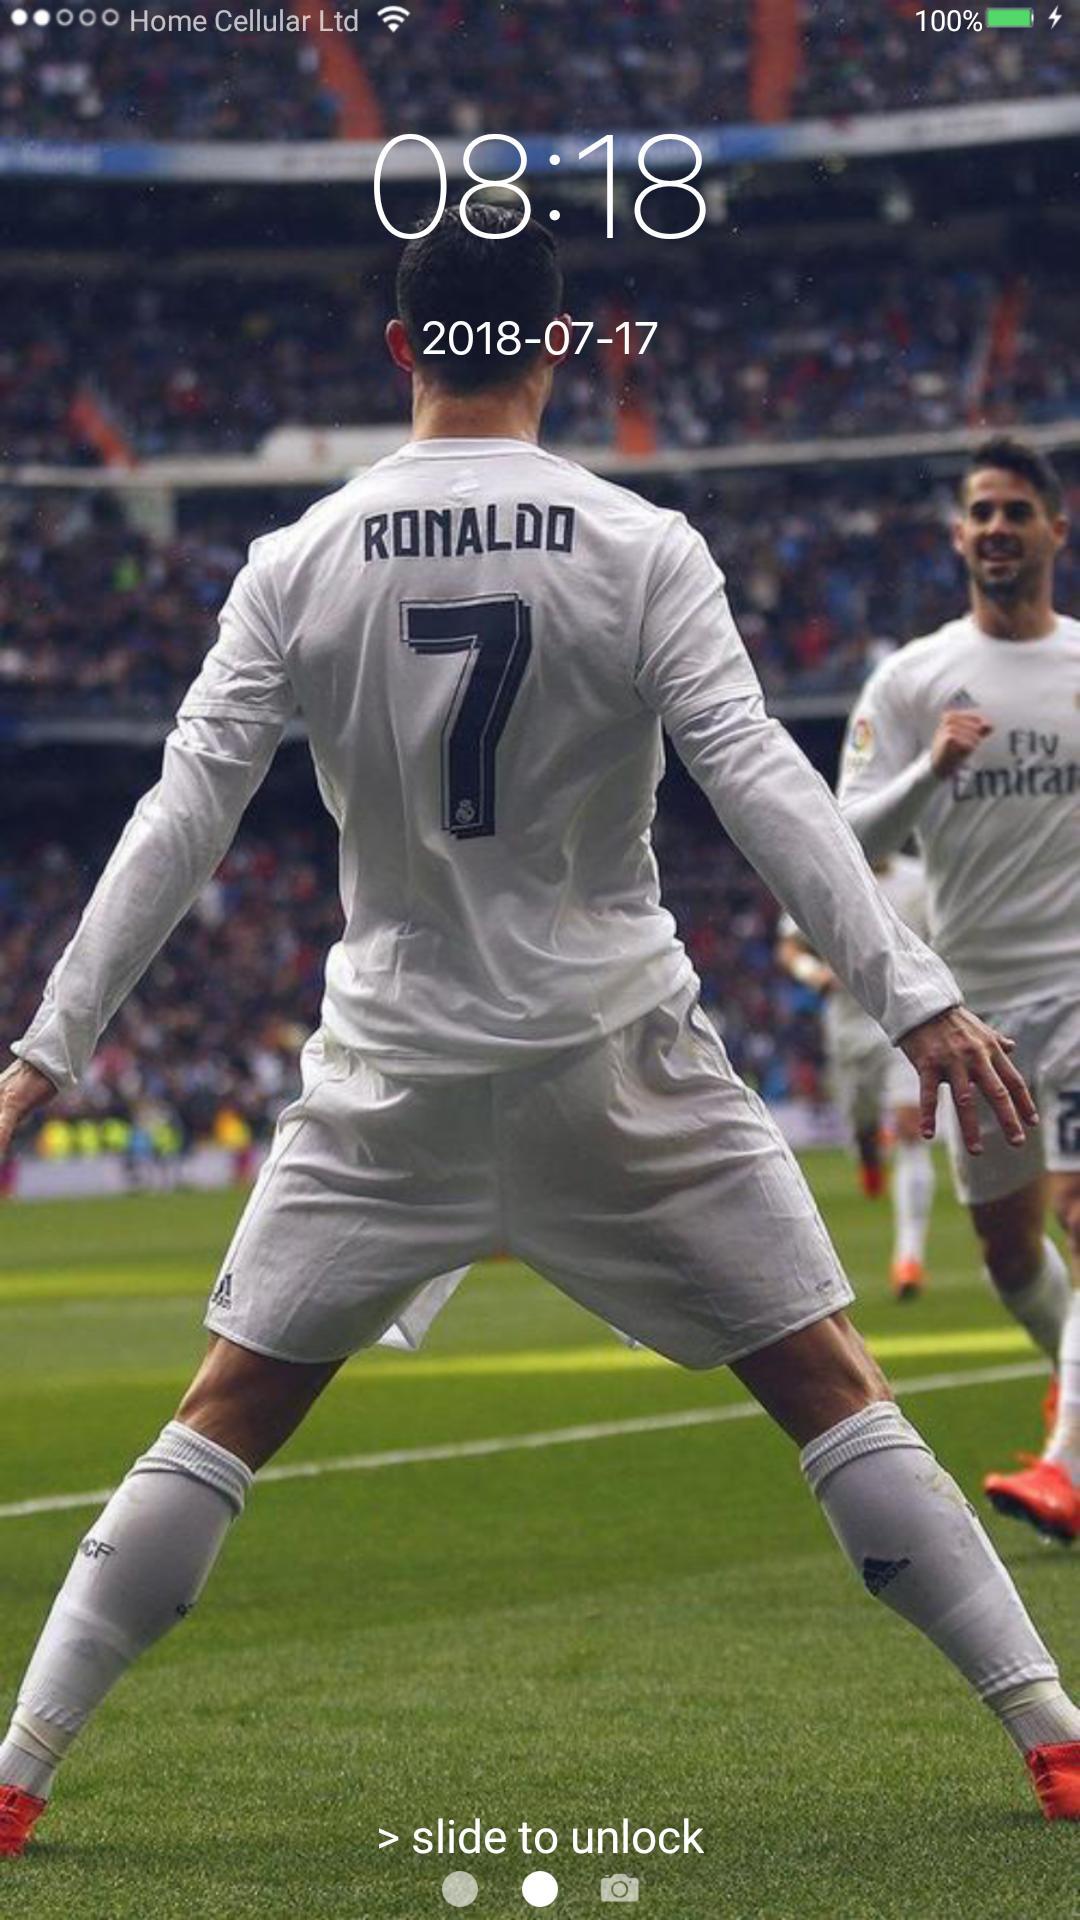 Cristiano Ronaldo Lock Screen Hd 2018 For Android Apk Download